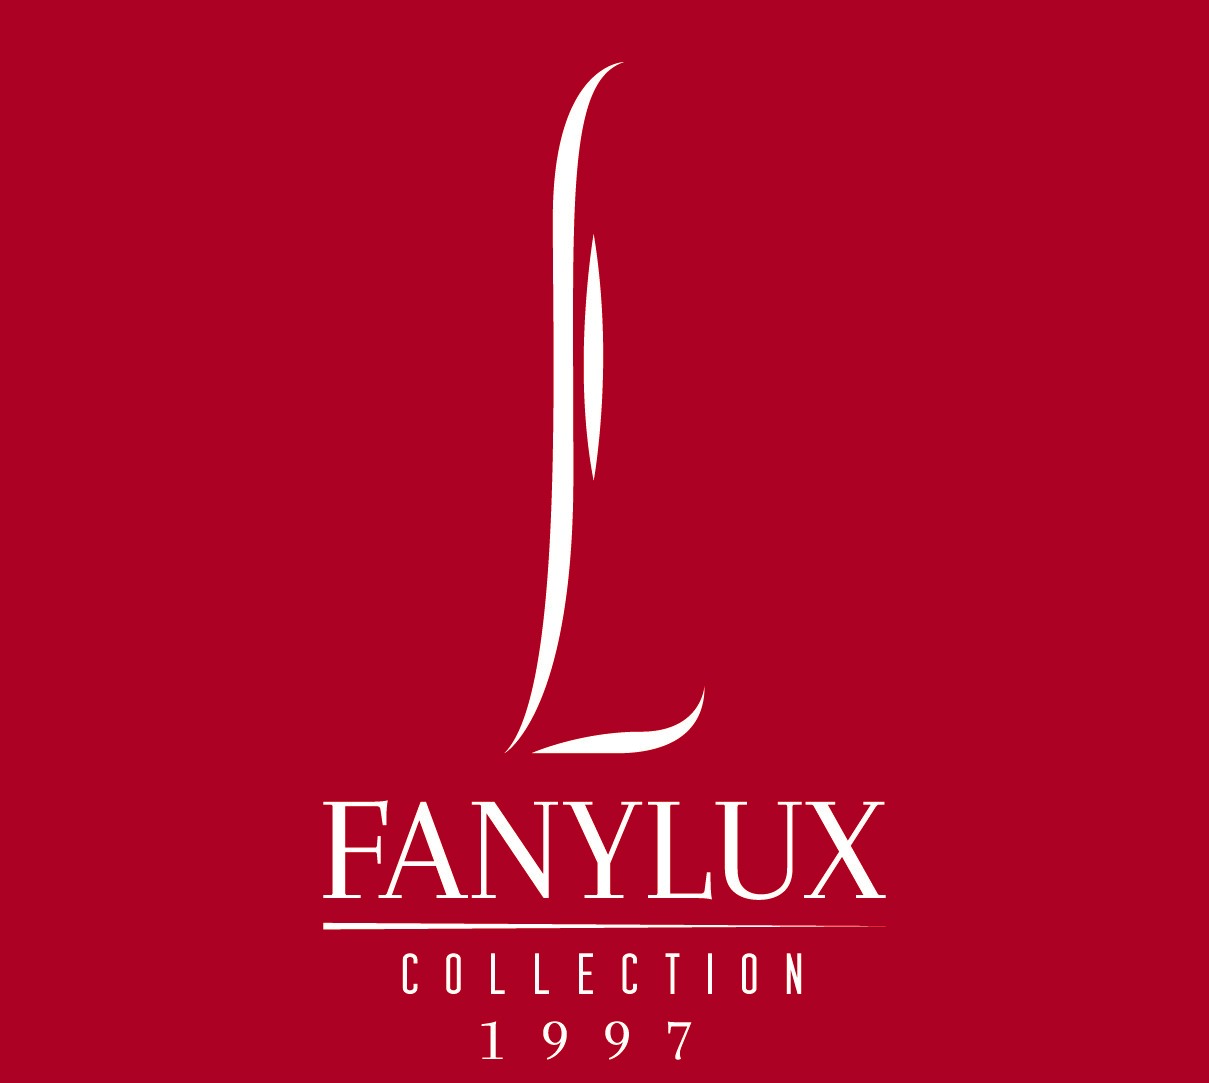 fanylux arad